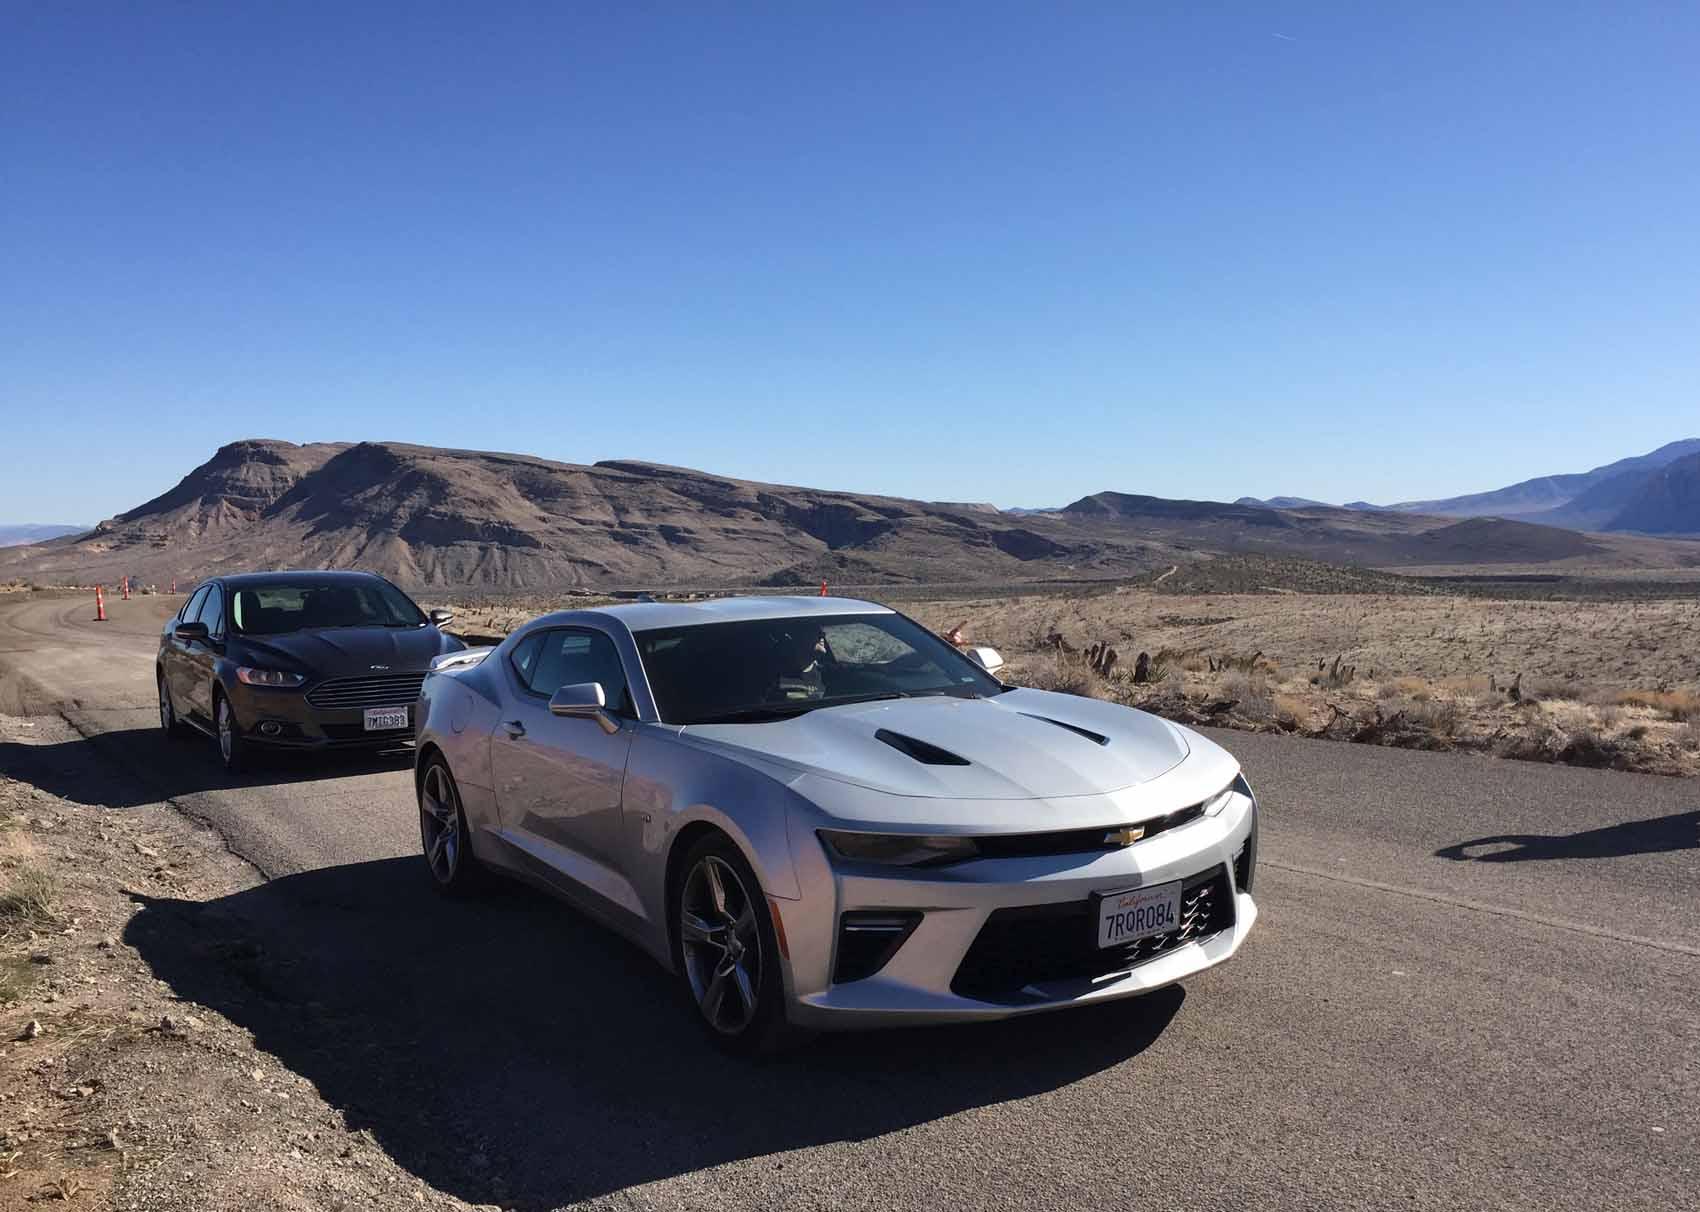 Camaro USA road trip